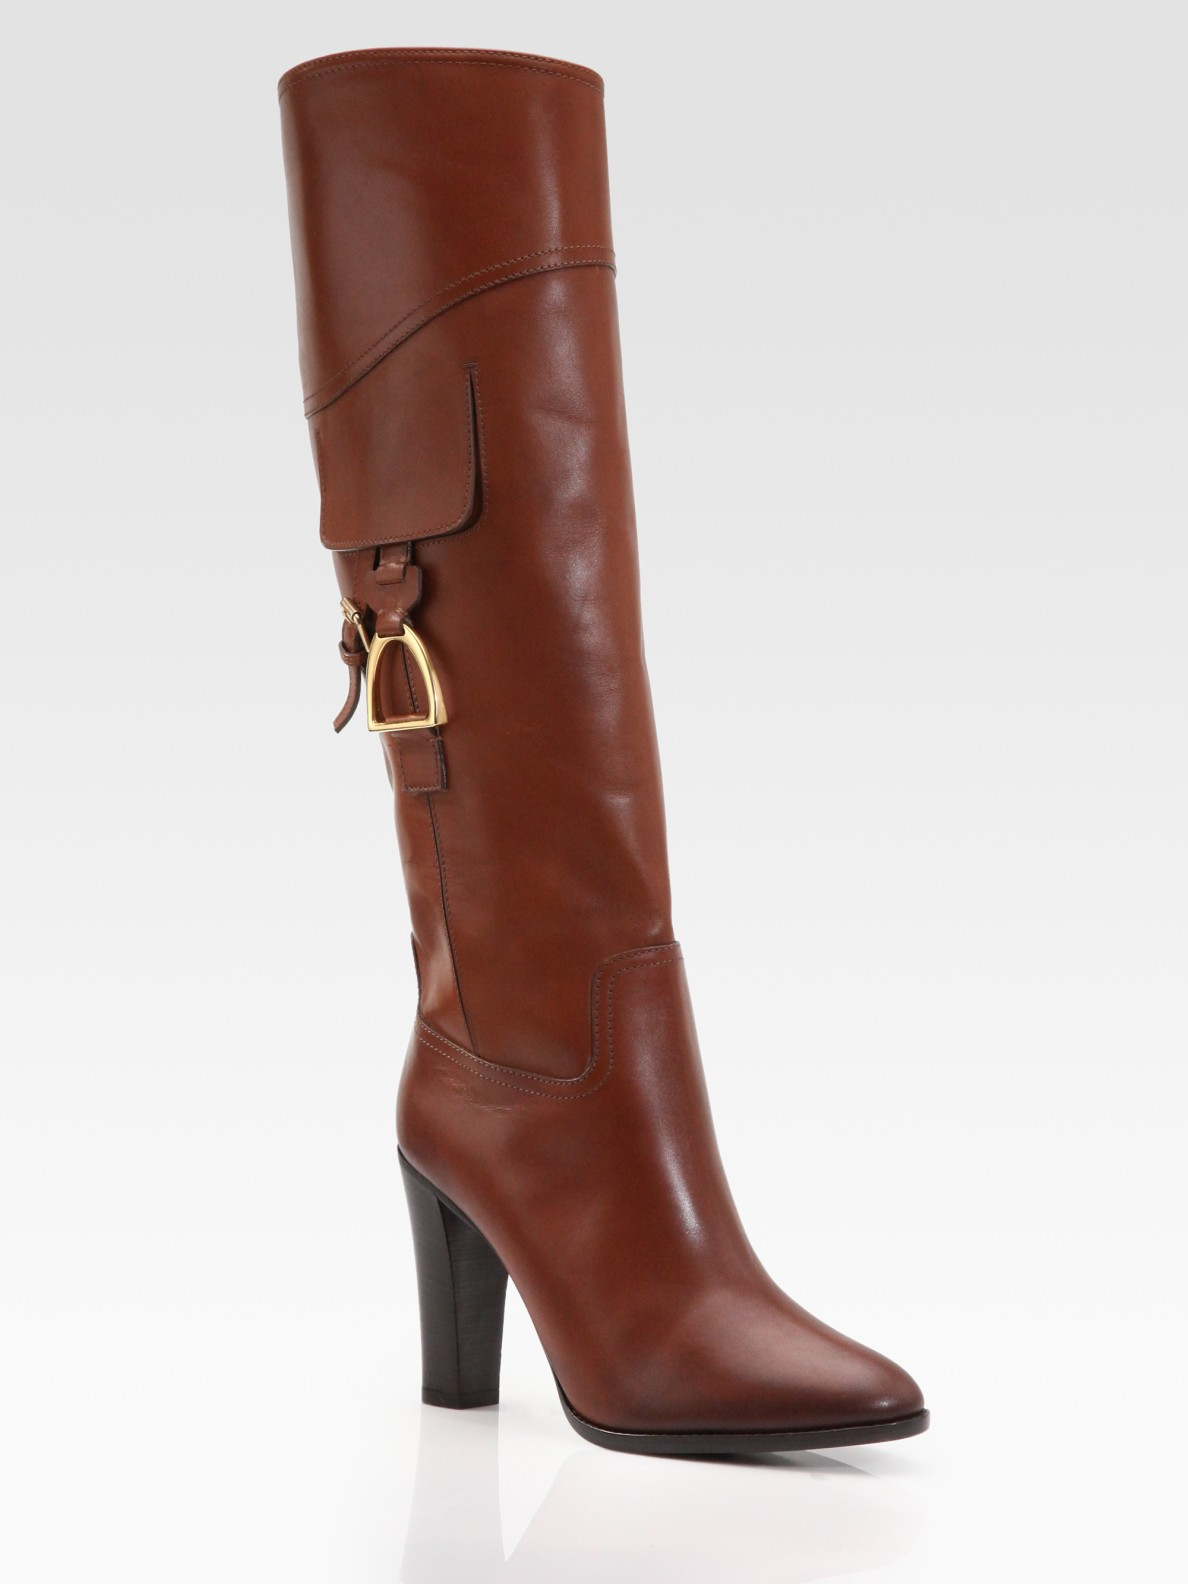 Gucci - tess leather horsebit boot 358215A3N002140   Boots